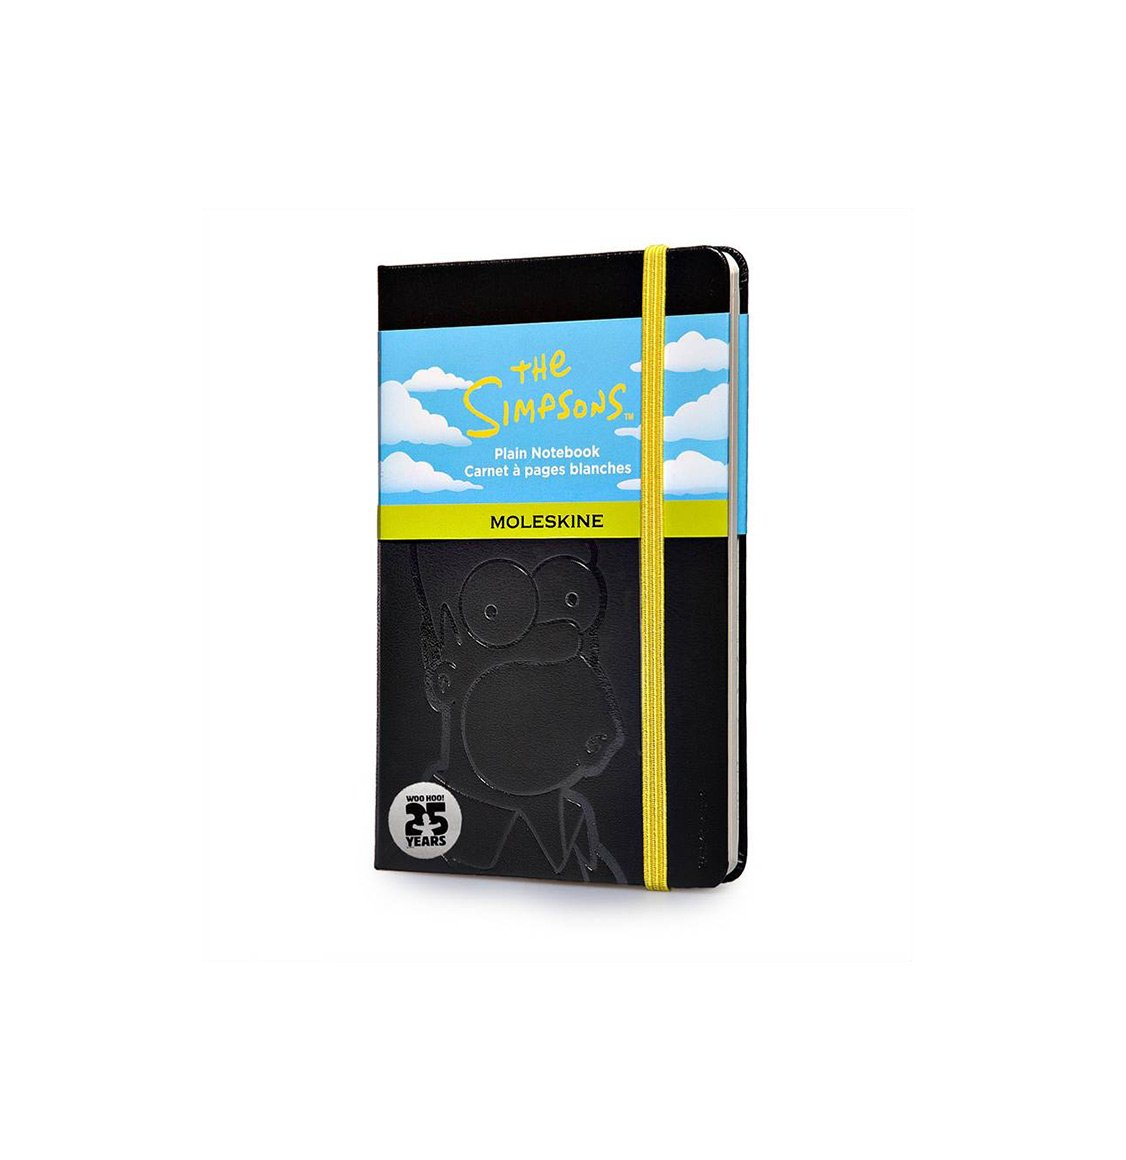 Moleskine The Simpsons Limited Edition Pocket Plain Notebook Black